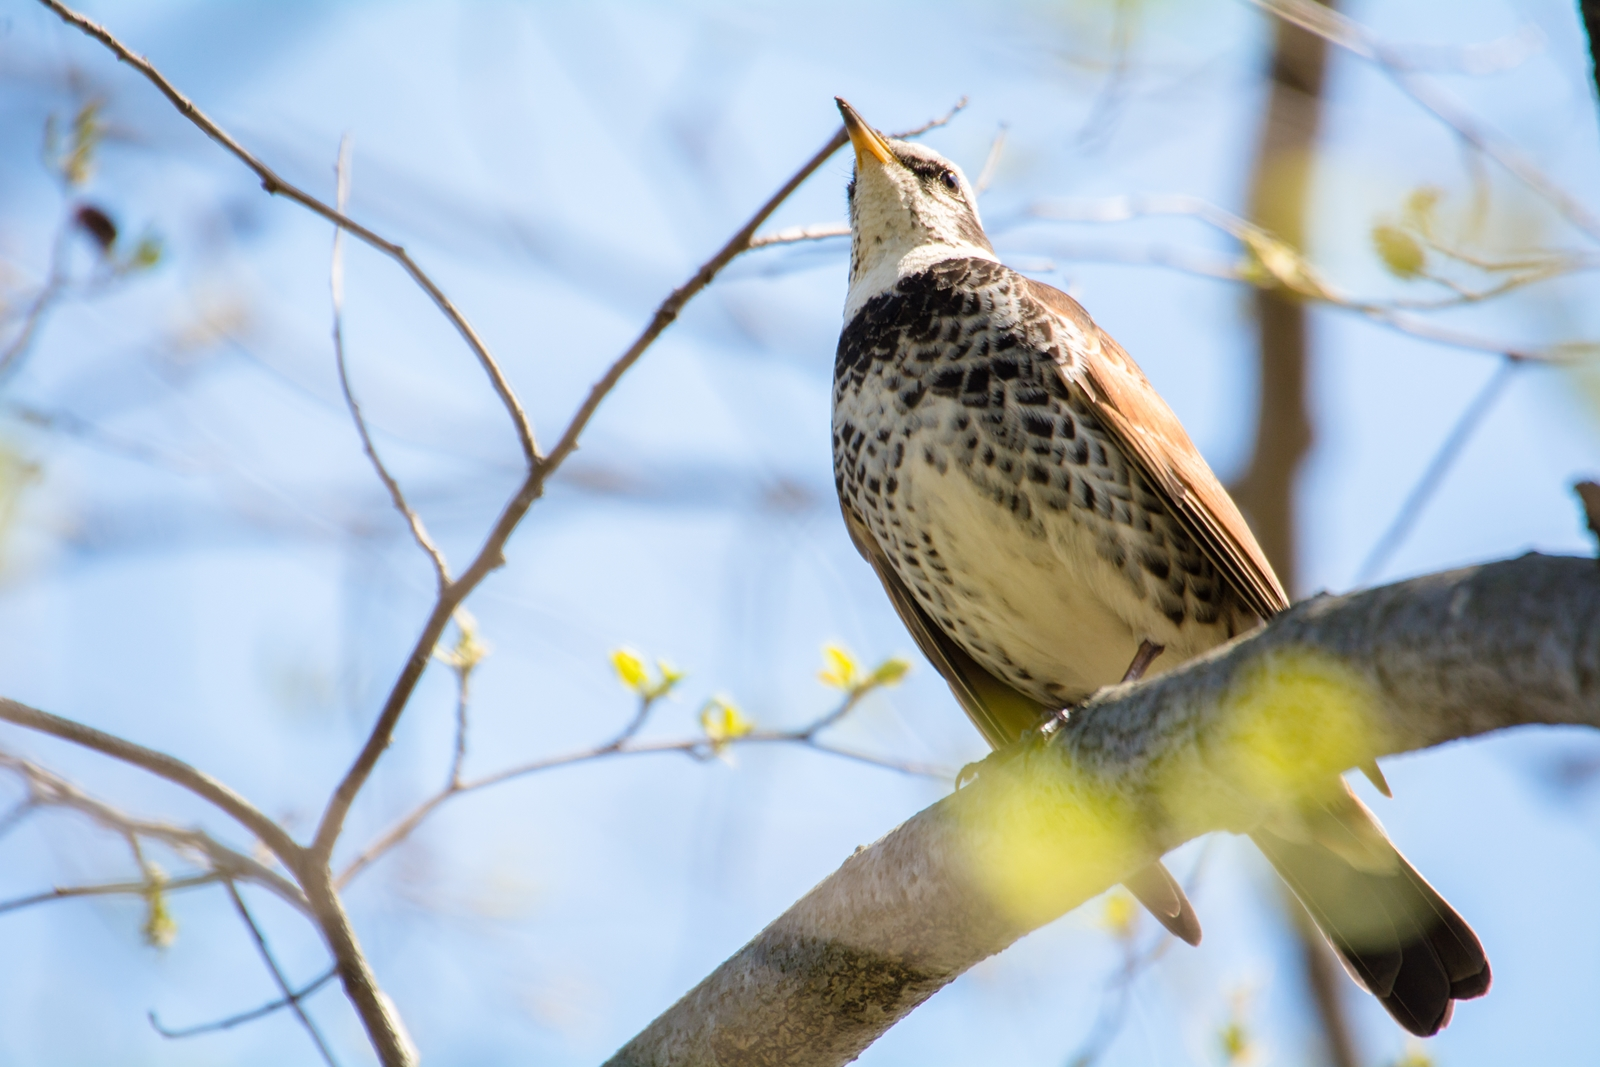 Photo: 萌える喜び Sprouted pleasure.  小さな芽たちが 次々と開いていく 訪れる緑の季節 希望を胸に喜びを浮かべて  Dusky thrush. (水元公園のツグミ)  #IslandGallery_BrightLights +Takahiro Yamamoto +Island Gallery  #cooljapan #birdphotography #birds  #sigma #kawaii   Nikon D7100 SIGMA APO 50-500mm F5-6.3 DG OS HSM (2枚追加:Added 2 photo)  小鳥の詩朗読 https://youtu.be/-vaFMdhQpAo?list=PL2YtHGm0-R3qVsaqvQe9OYdJFCkI98wzF